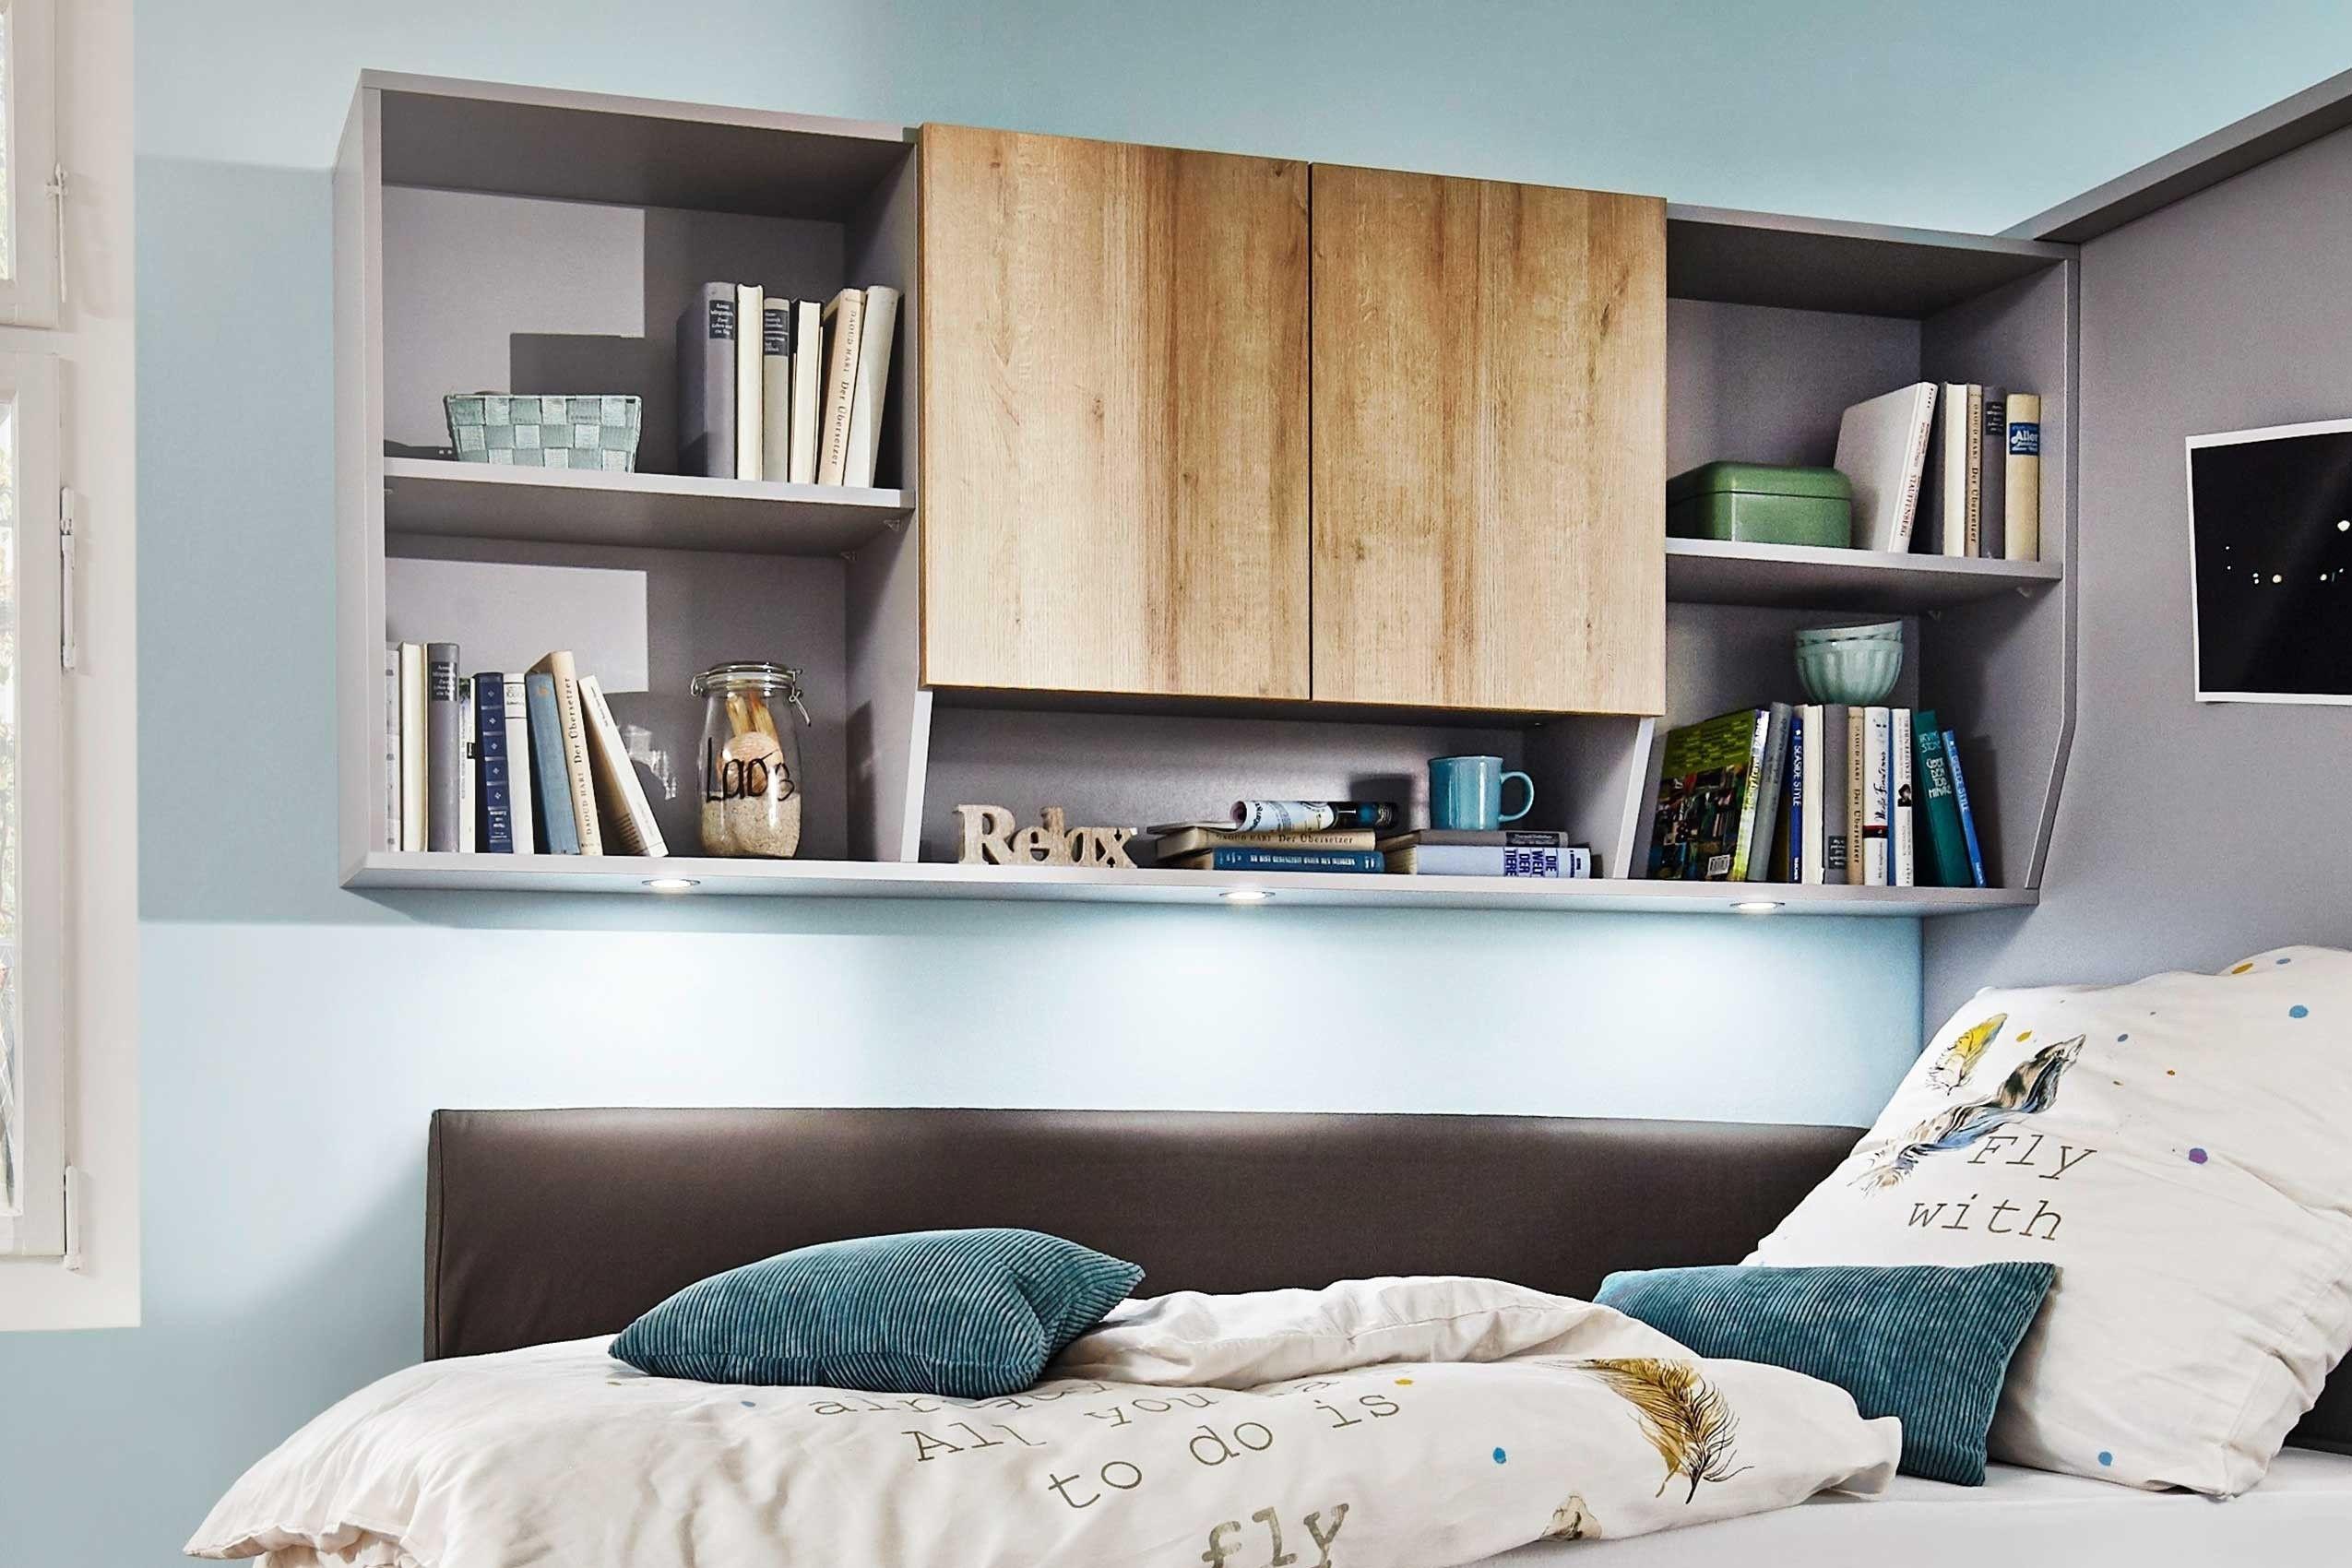 Bettuberbau Ohne Bett Bett Mobel Schlafzimmer Design Bettuberbau